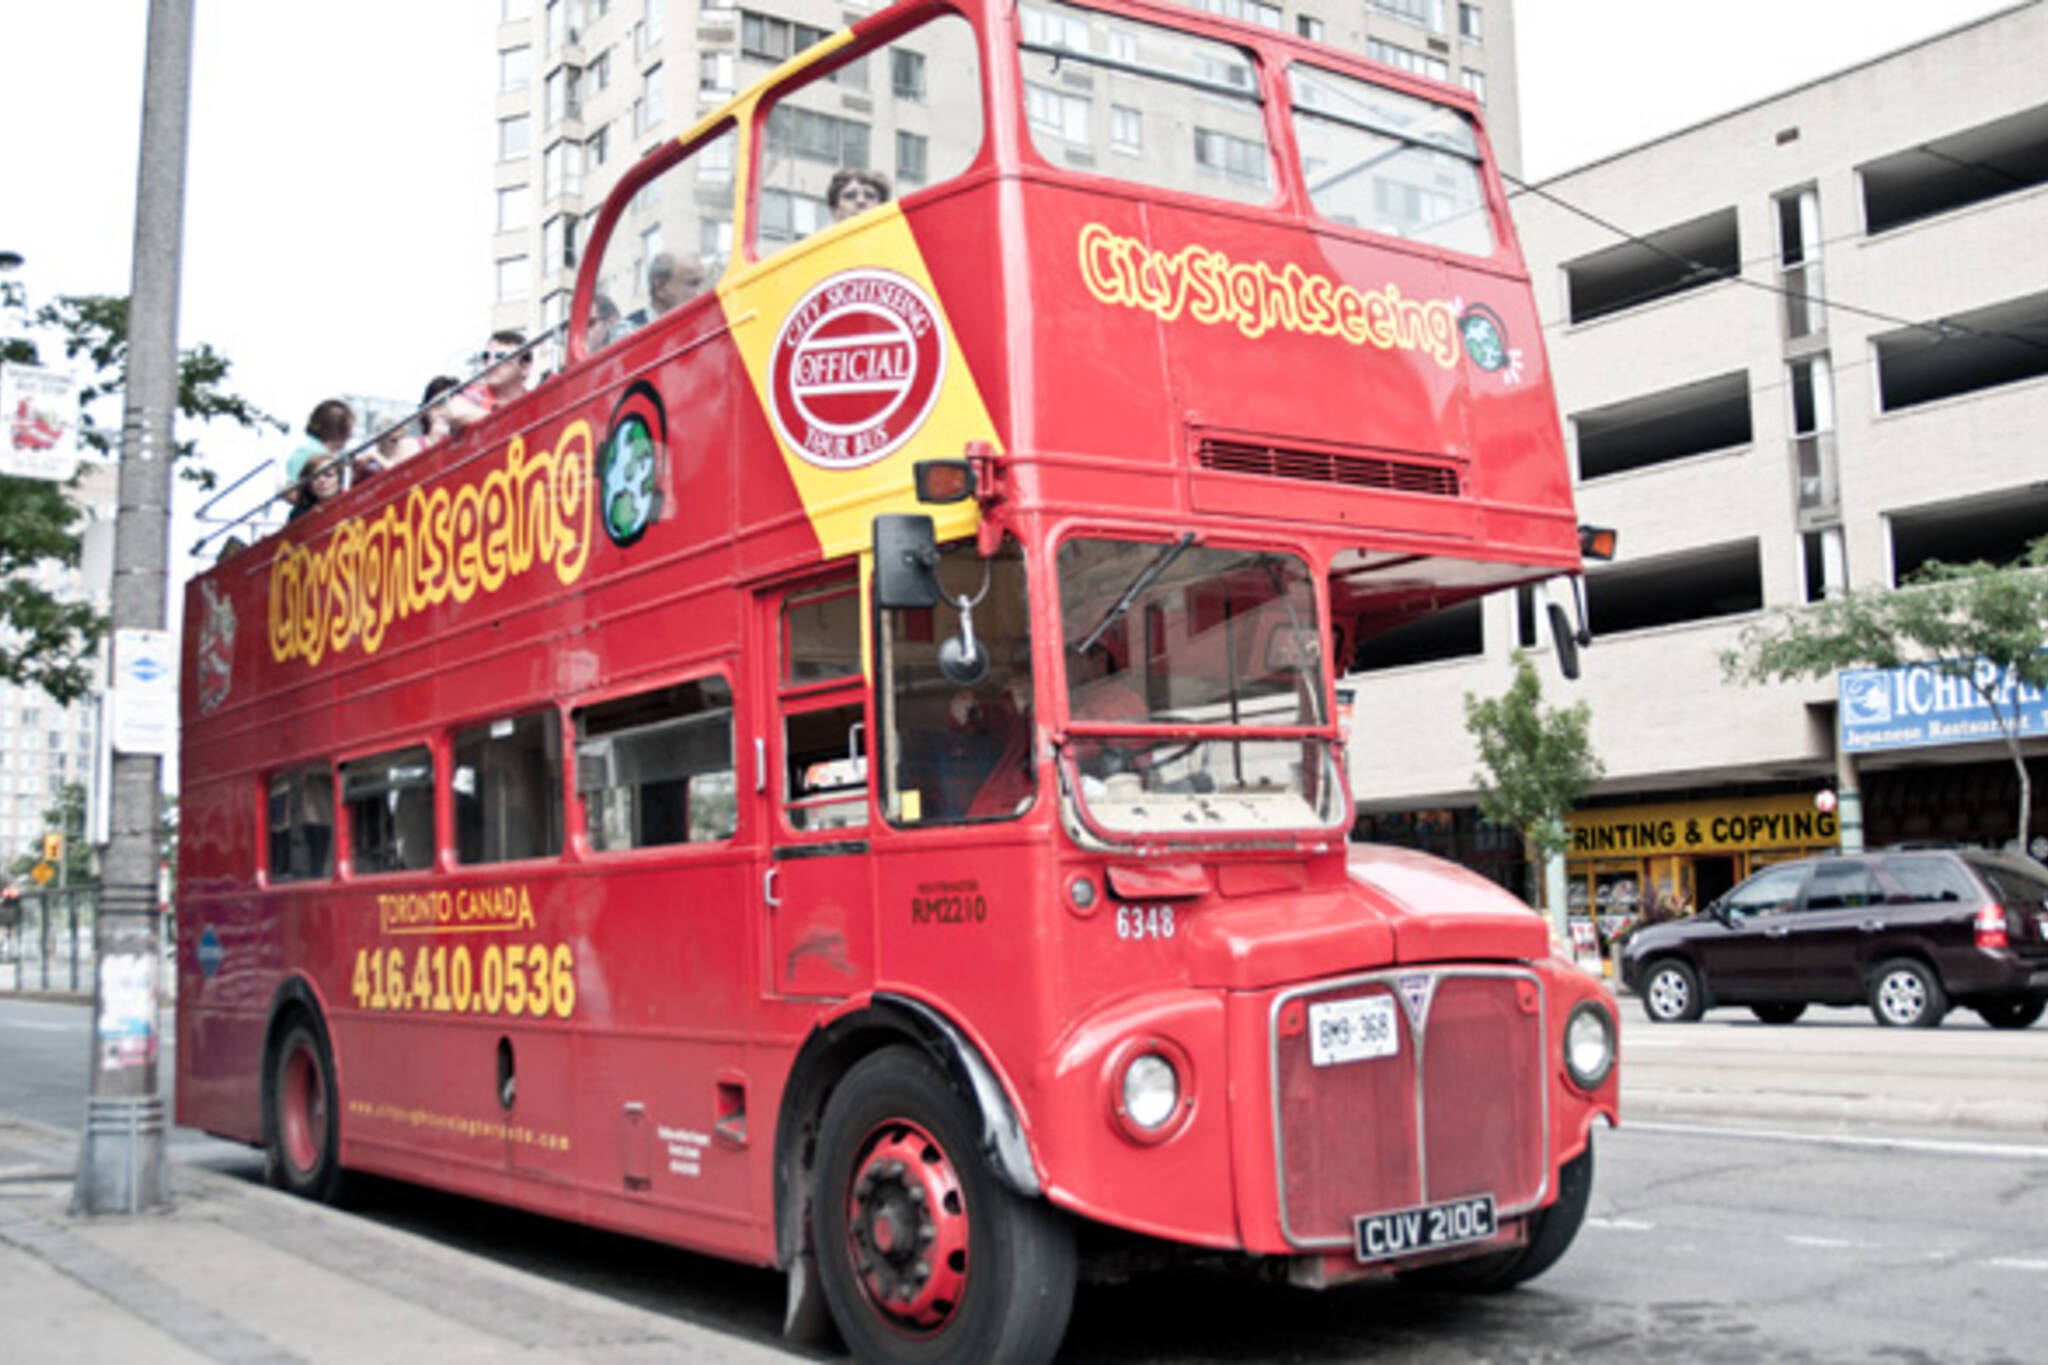 Toronto sightseeing bus tour